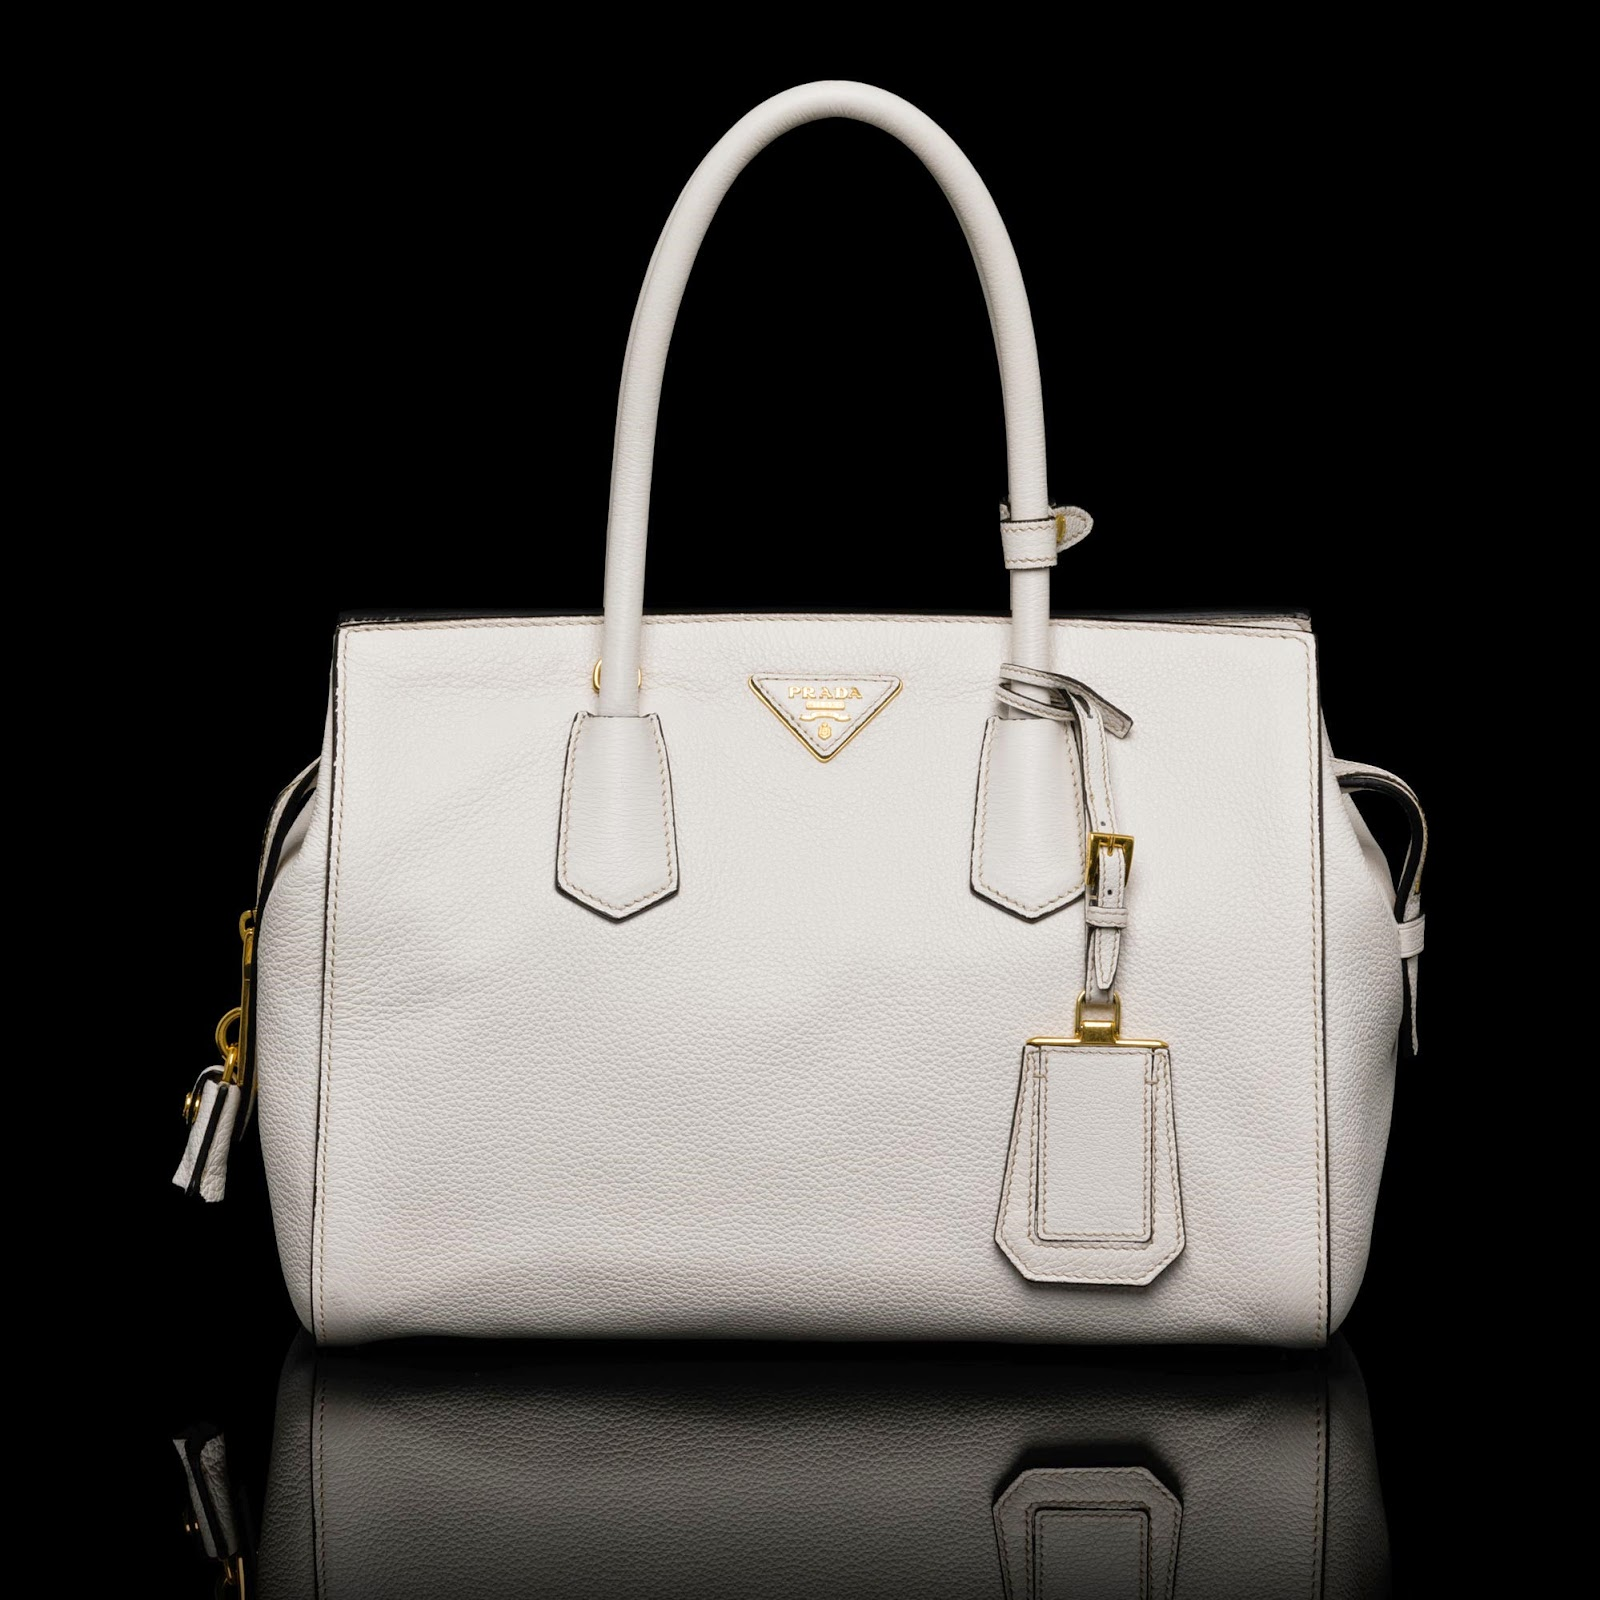 latest prada bag - Neo LUXuries: PRADA Medium Vitello Daino Calf Leather Top-Handle ...